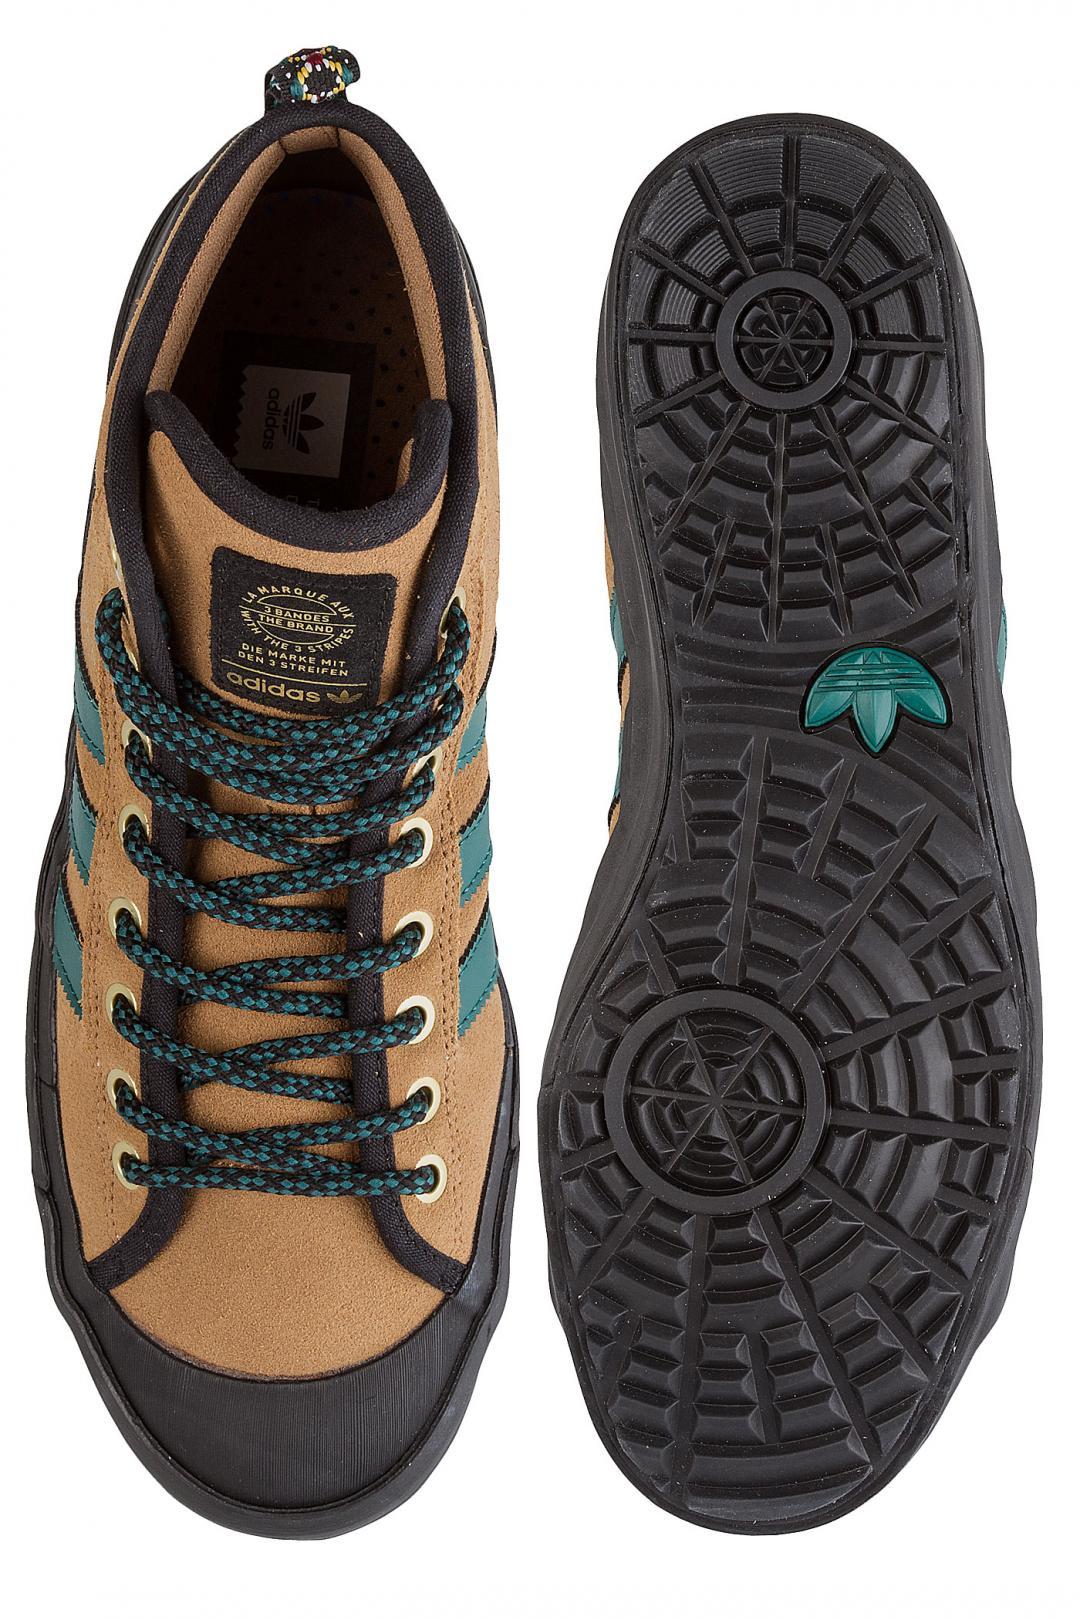 Uomo adidas Skateboarding Matchcourt High RX3 ravv desert noble green core bla | Sneakers high top